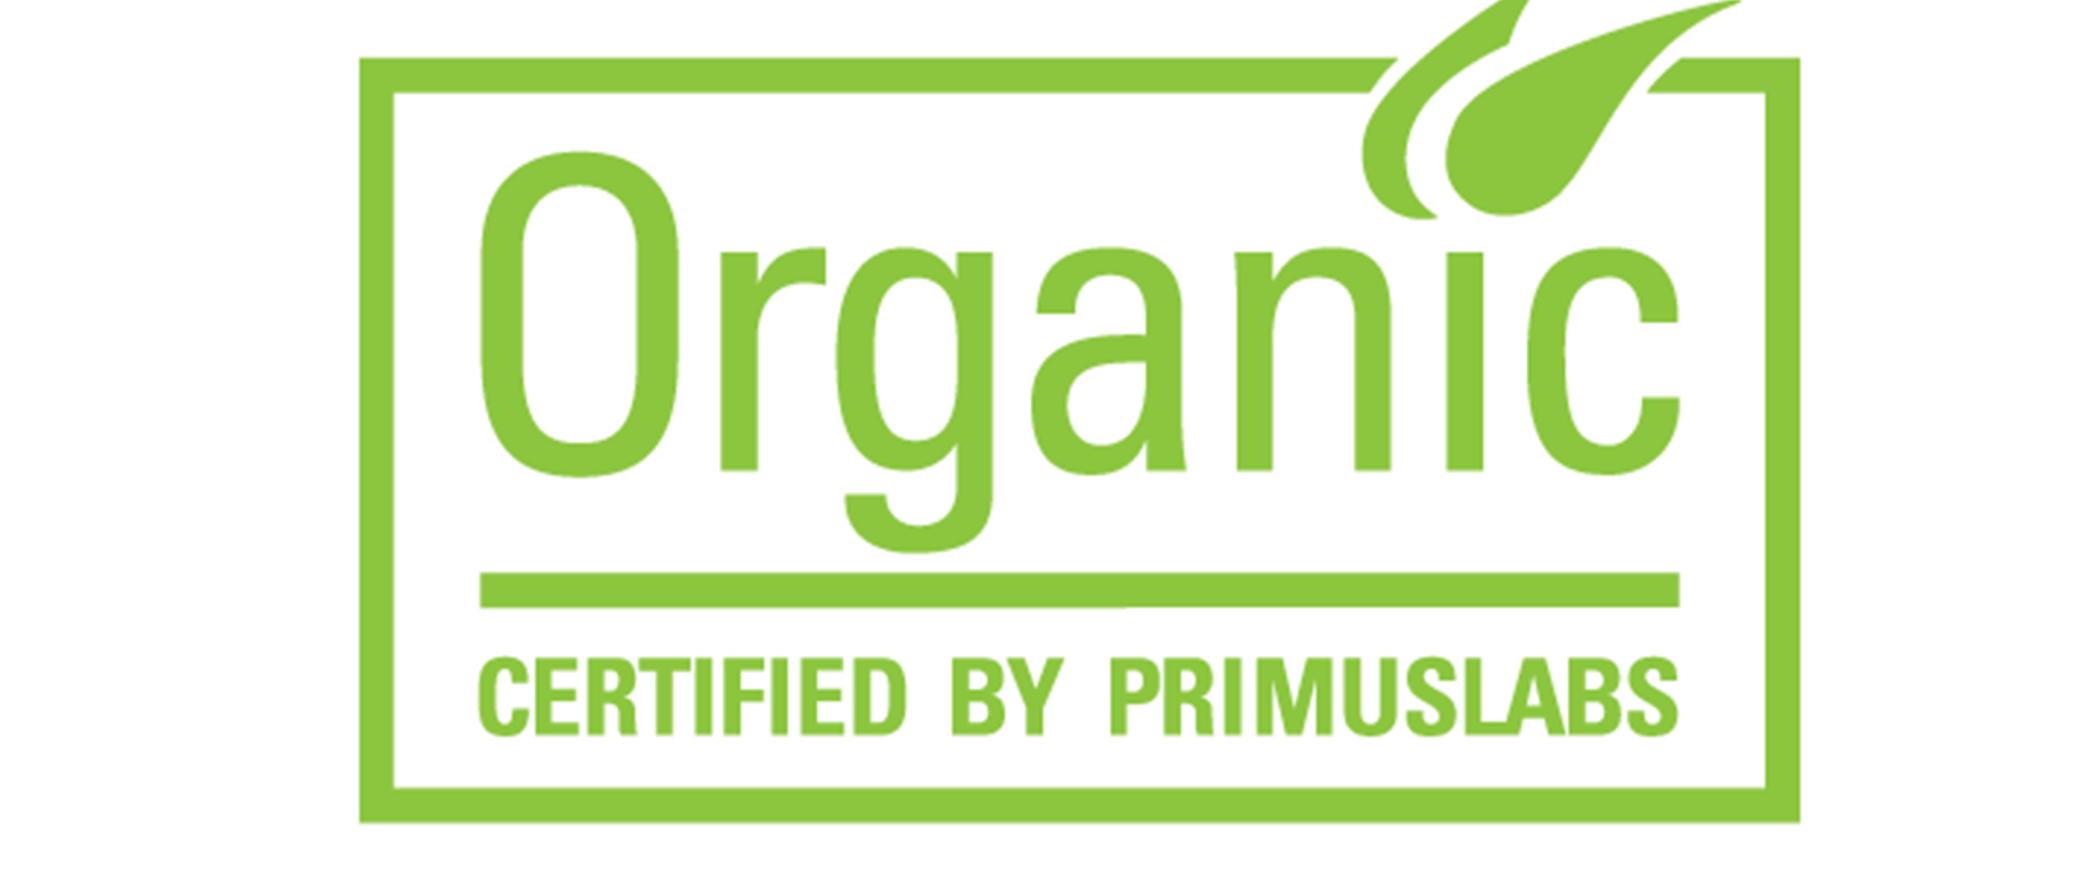 Primuslabs Organic